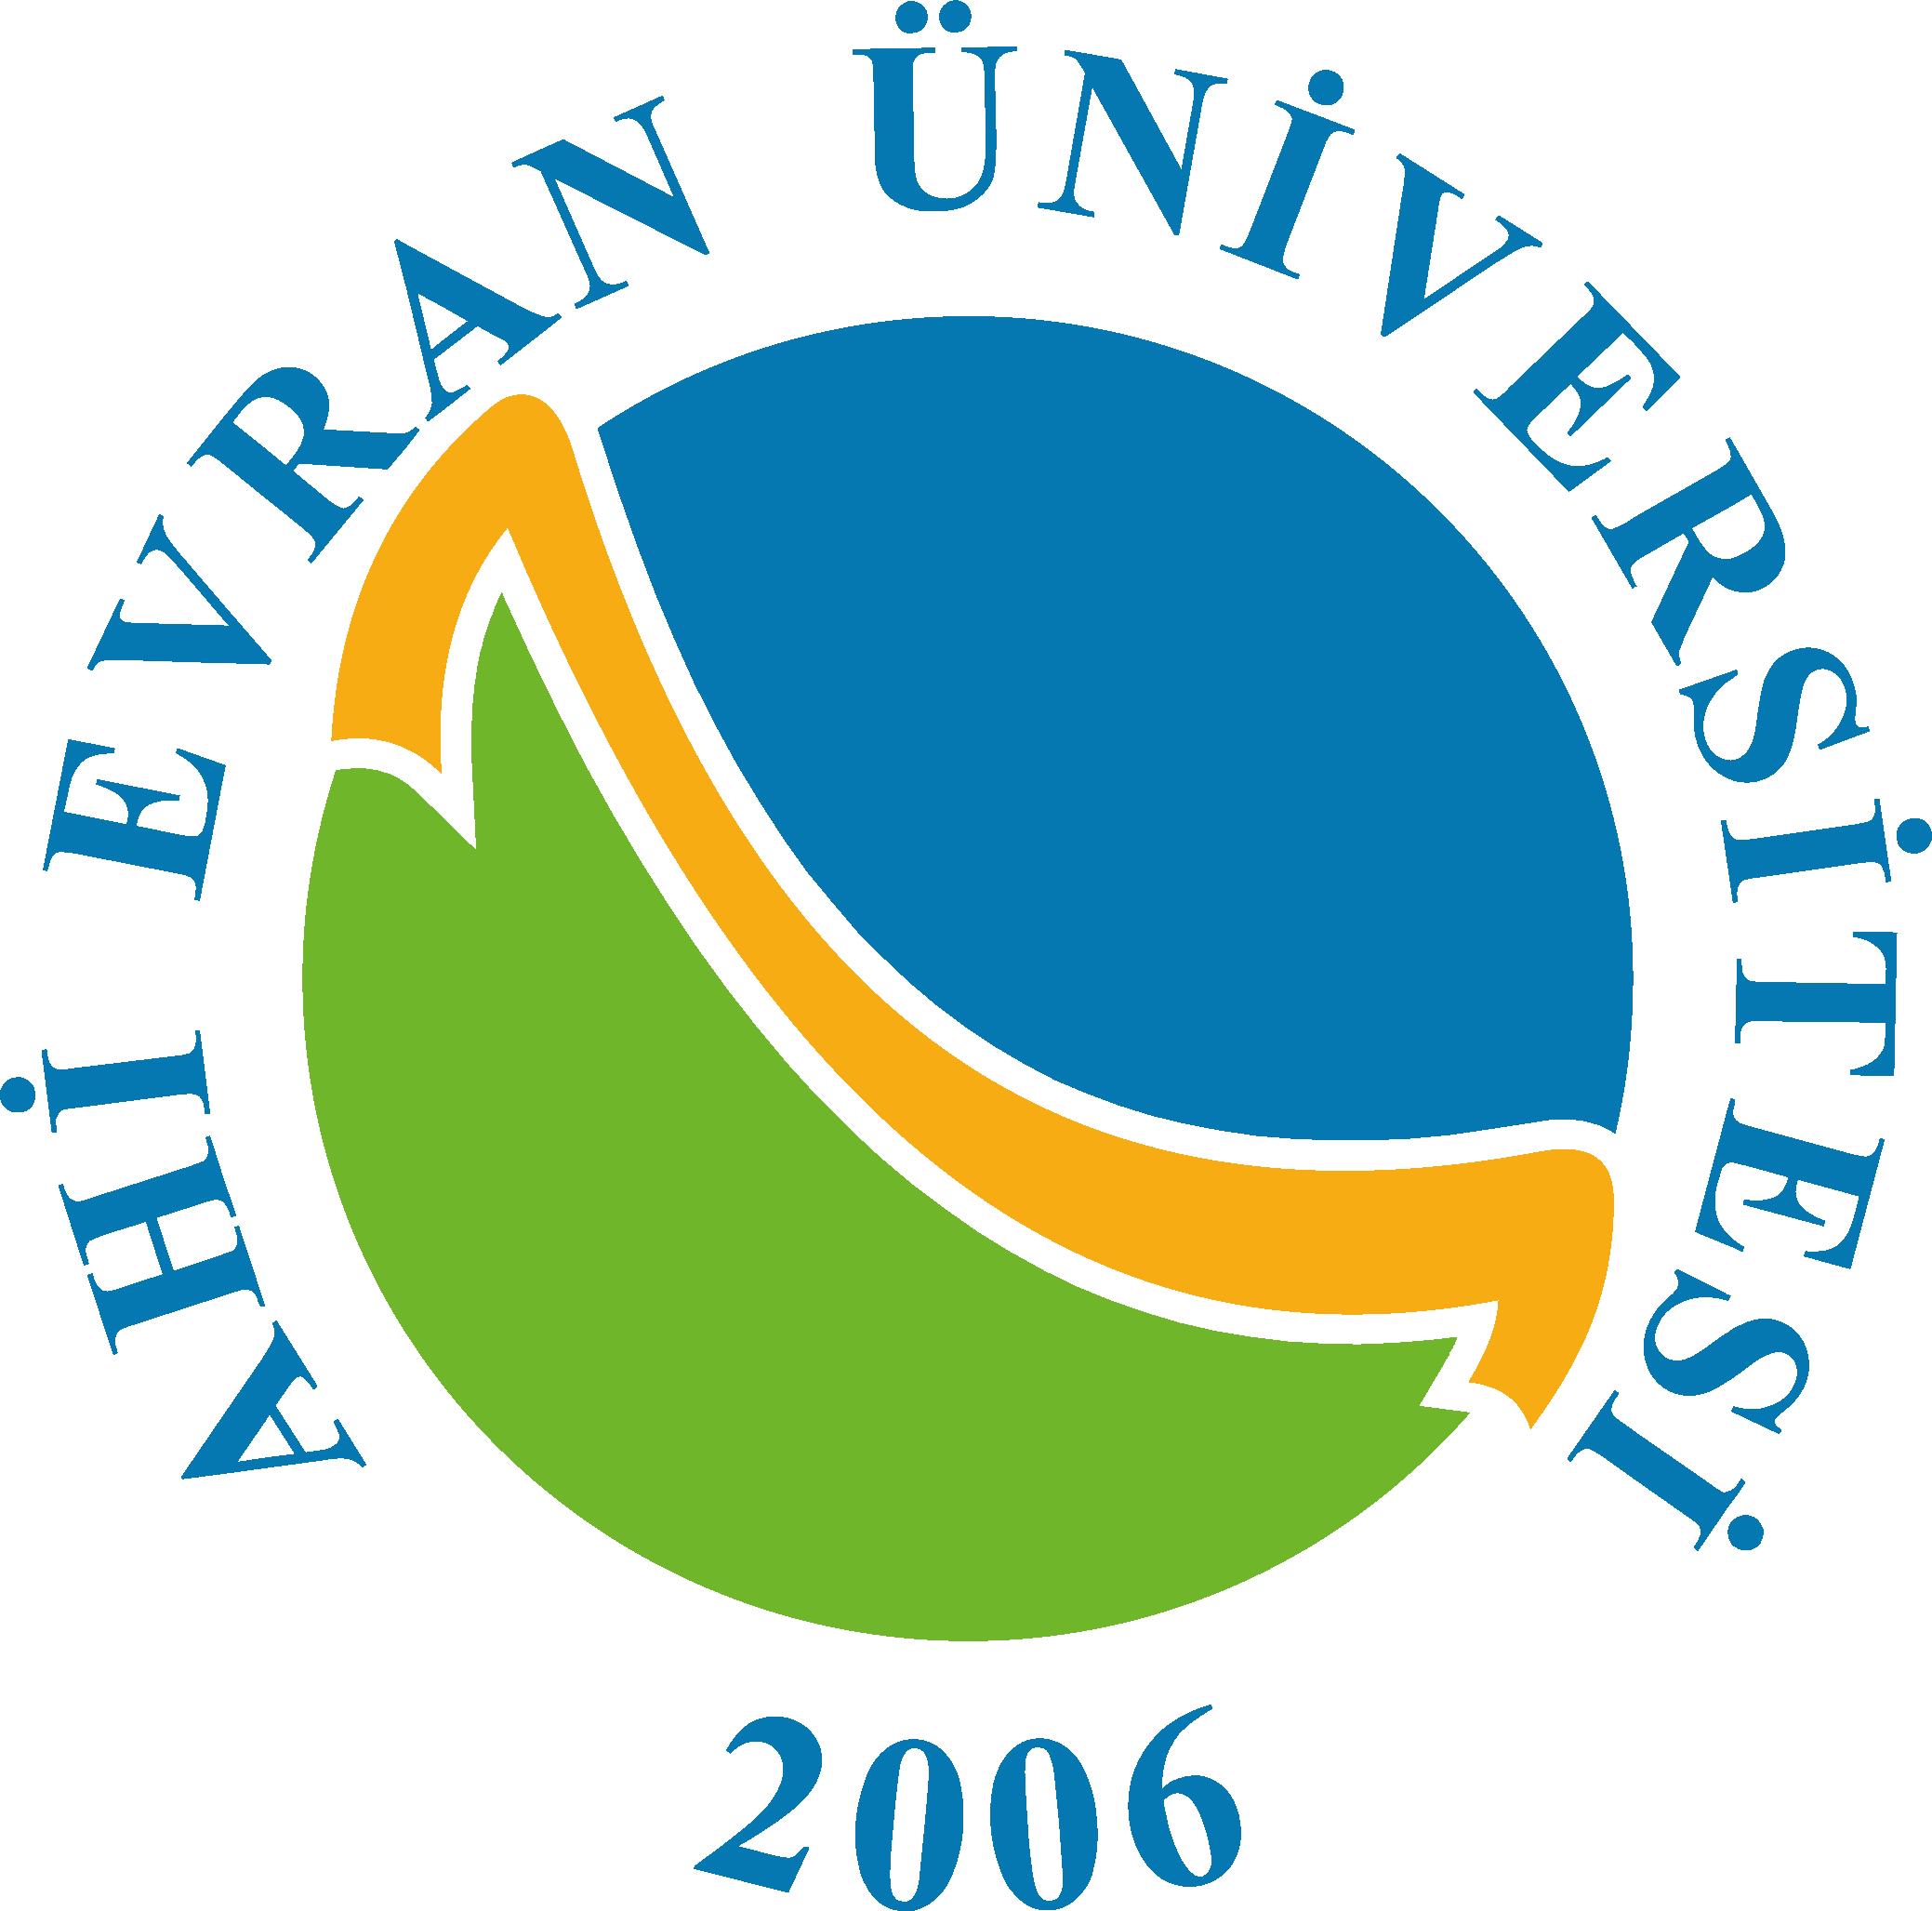 Ahi Evran Üniversitesi Logo Amblem Download Vector